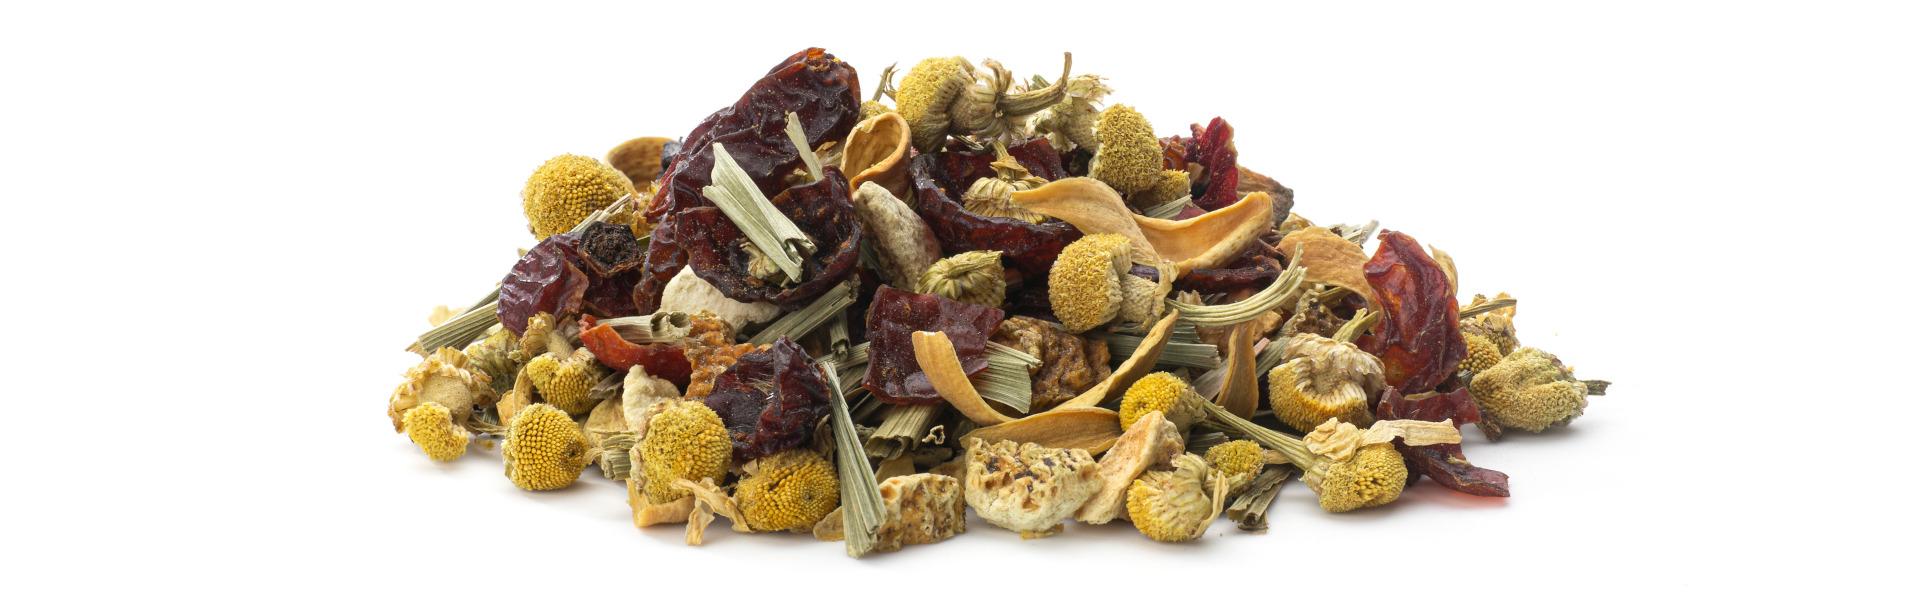 Herbal Republic Camillo Tea